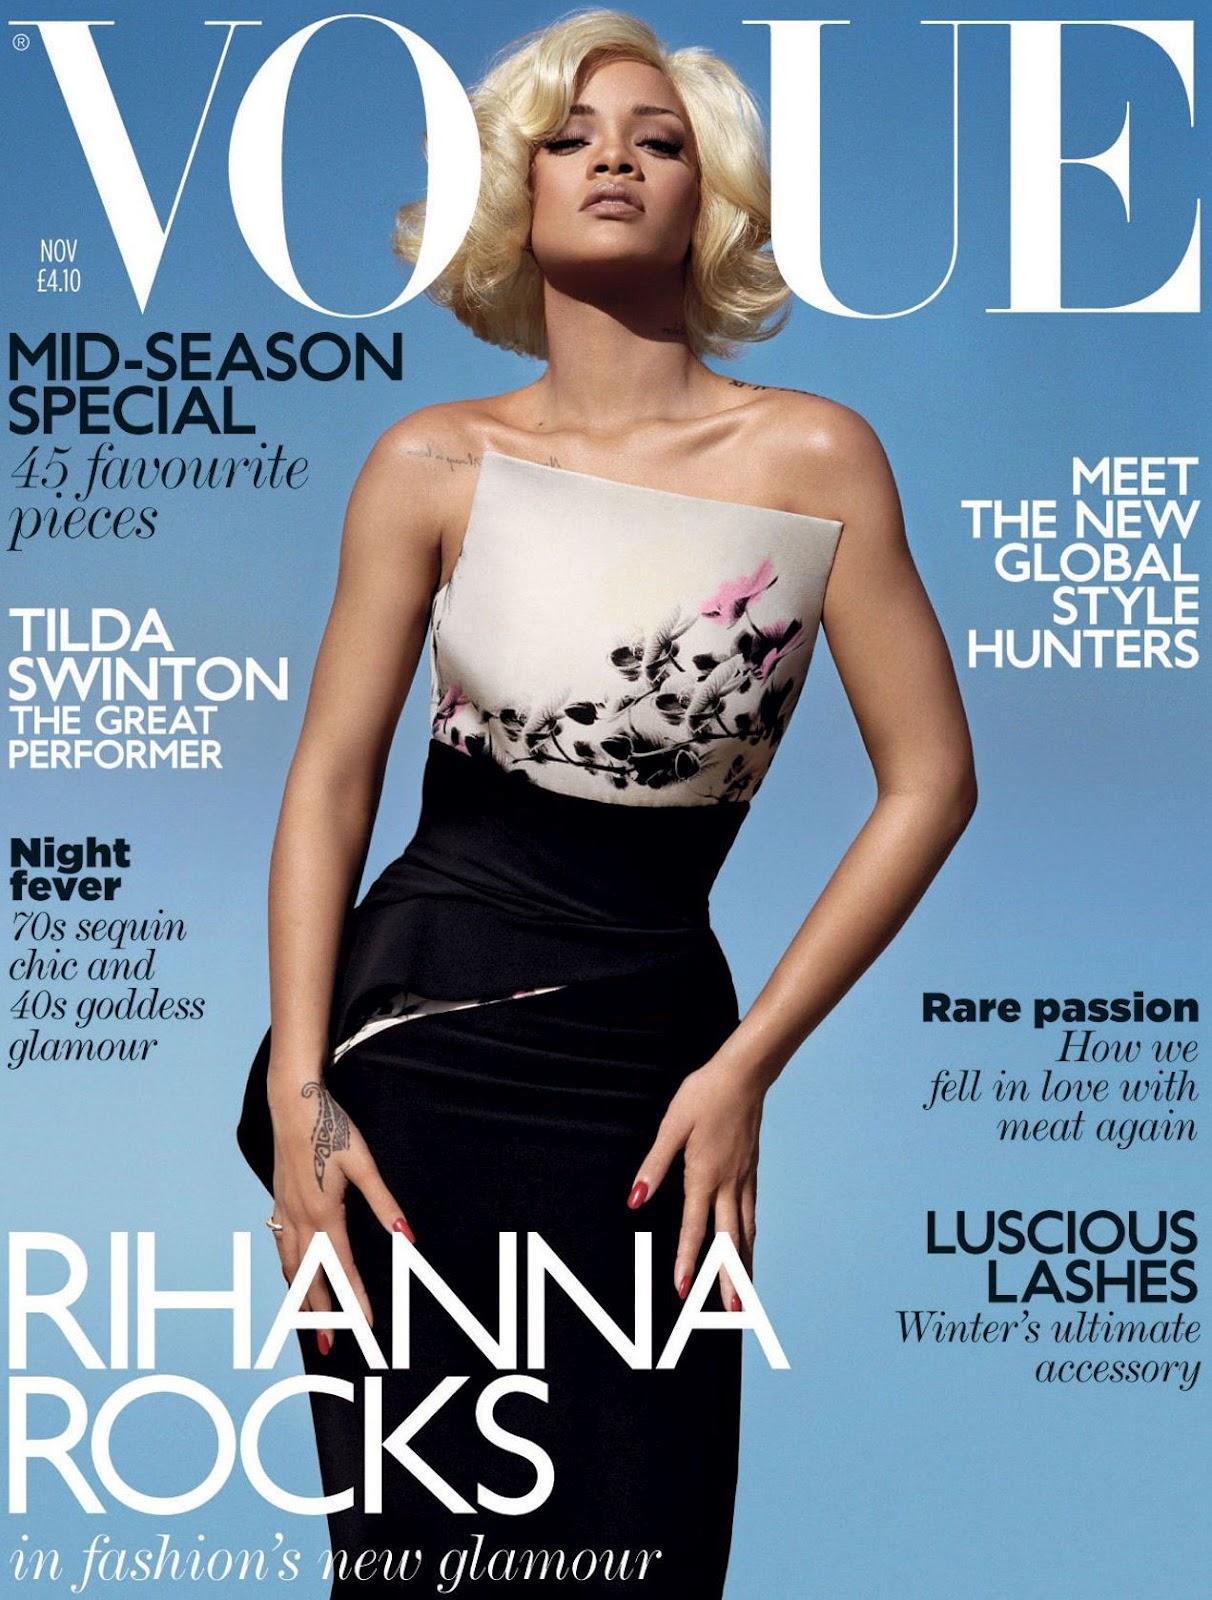 http://2.bp.blogspot.com/-L6g11MaKr_c/T2U4C02V3kI/AAAAAAAAD3w/7wzUc6TFAjY/s1600/Rihanna.jpg